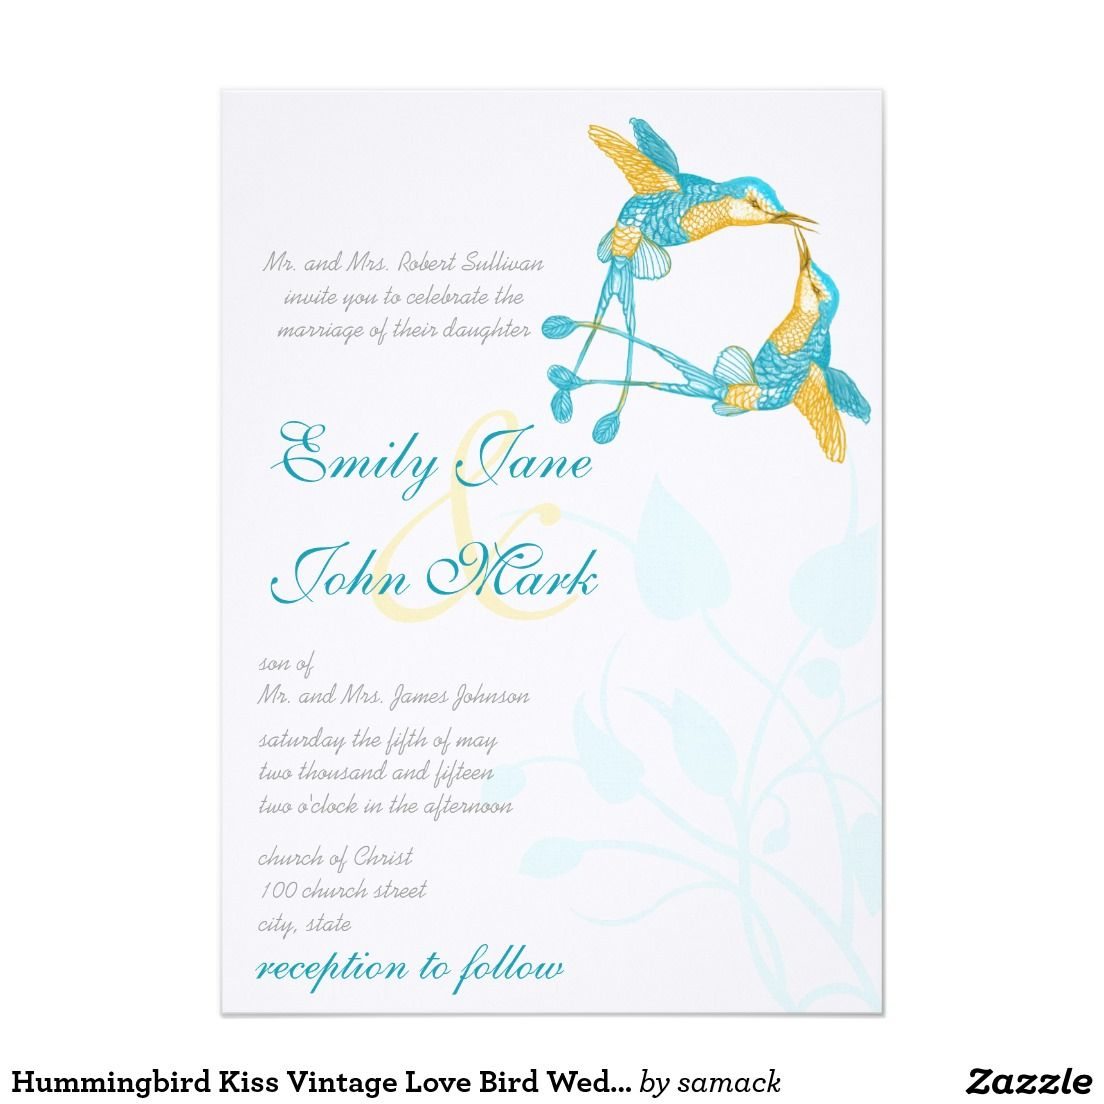 Hummingbird Kiss Vintage Love Bird Weddings Card | Turquoise + ...